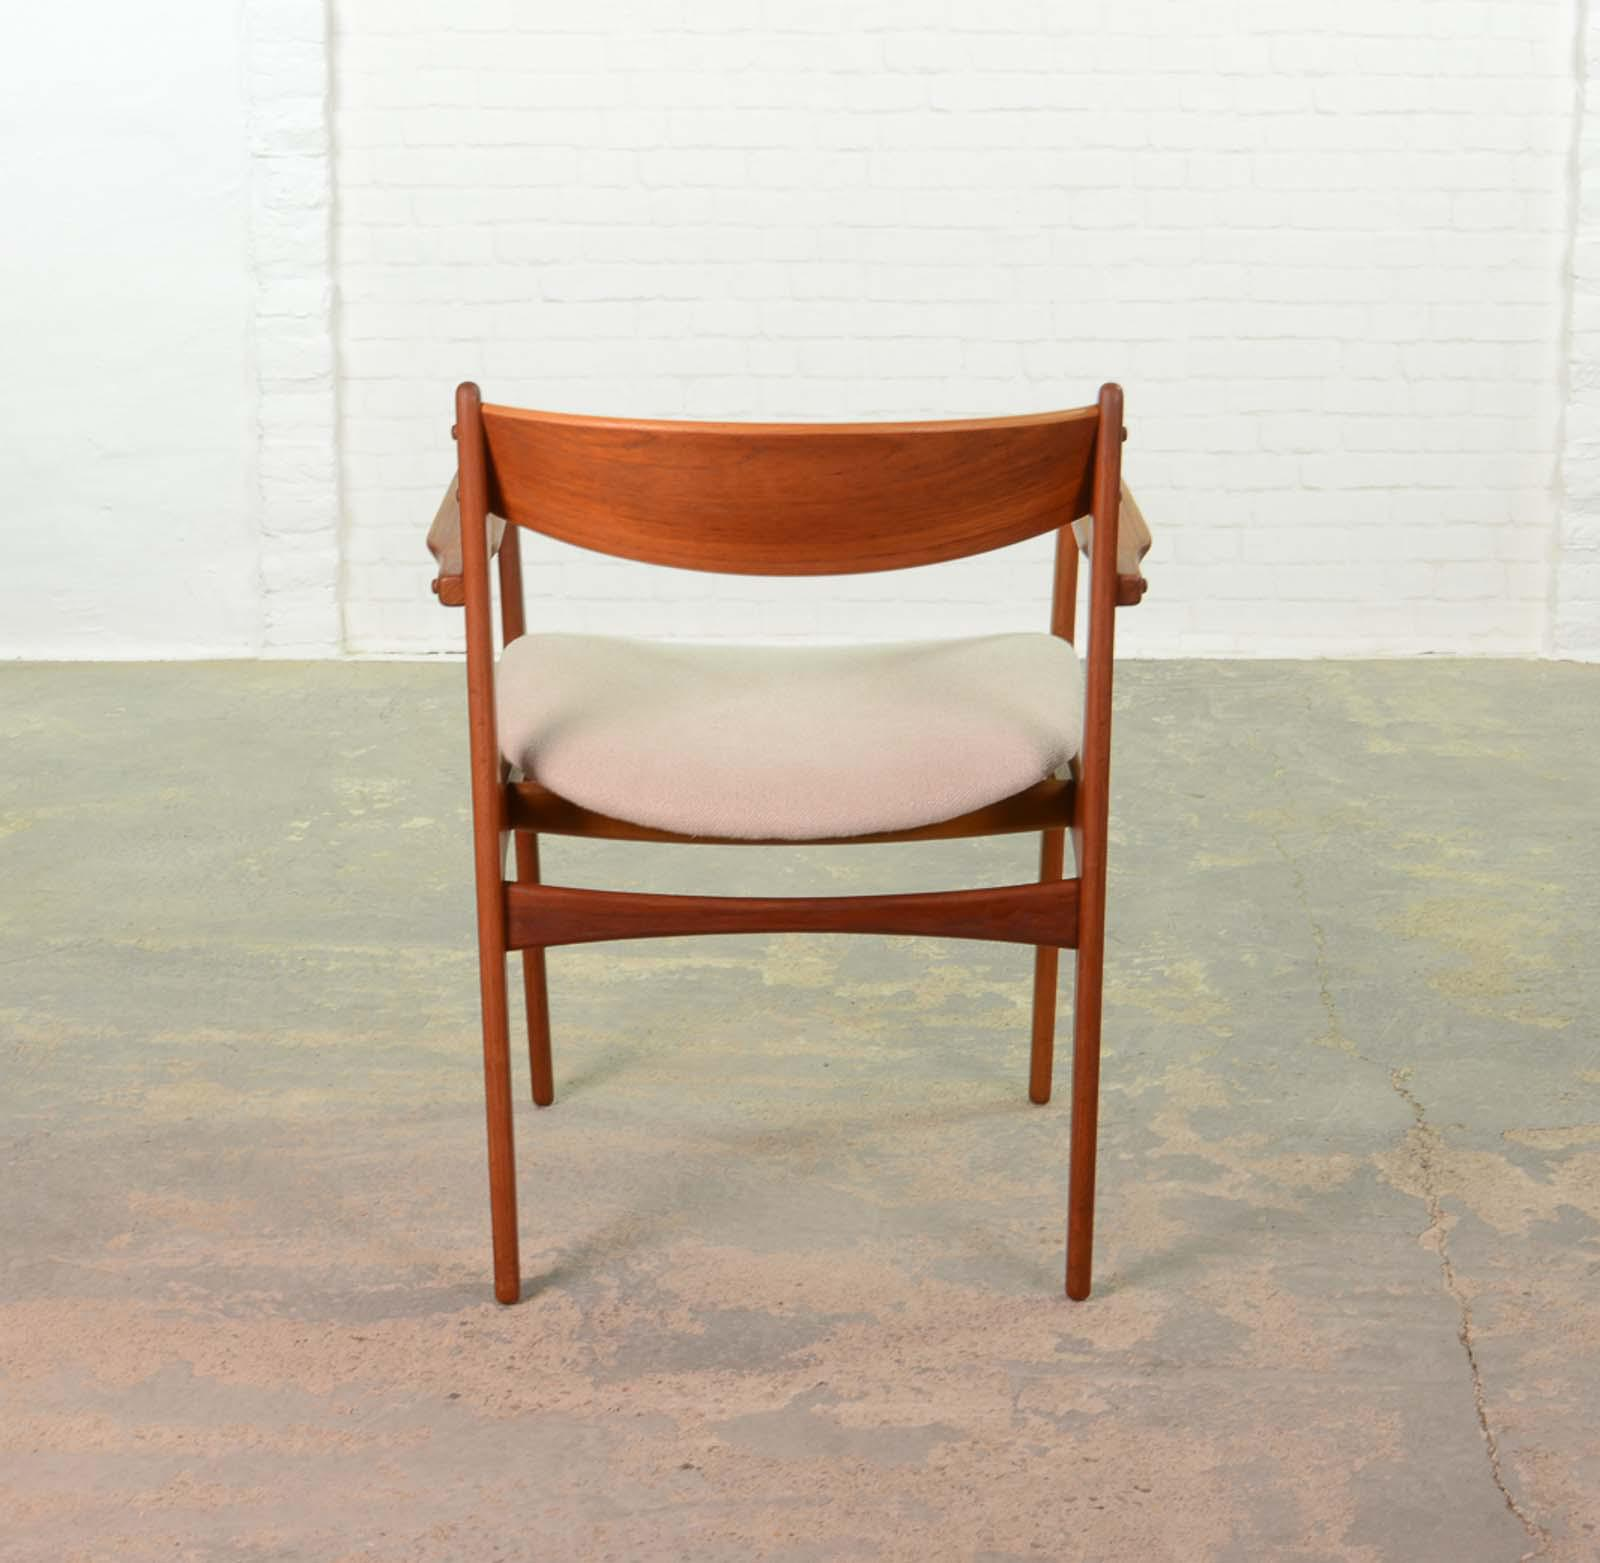 Mid Century Modern Danish Design Teakwood Desk Arm Side Chair By Erik Buch  For Oddense